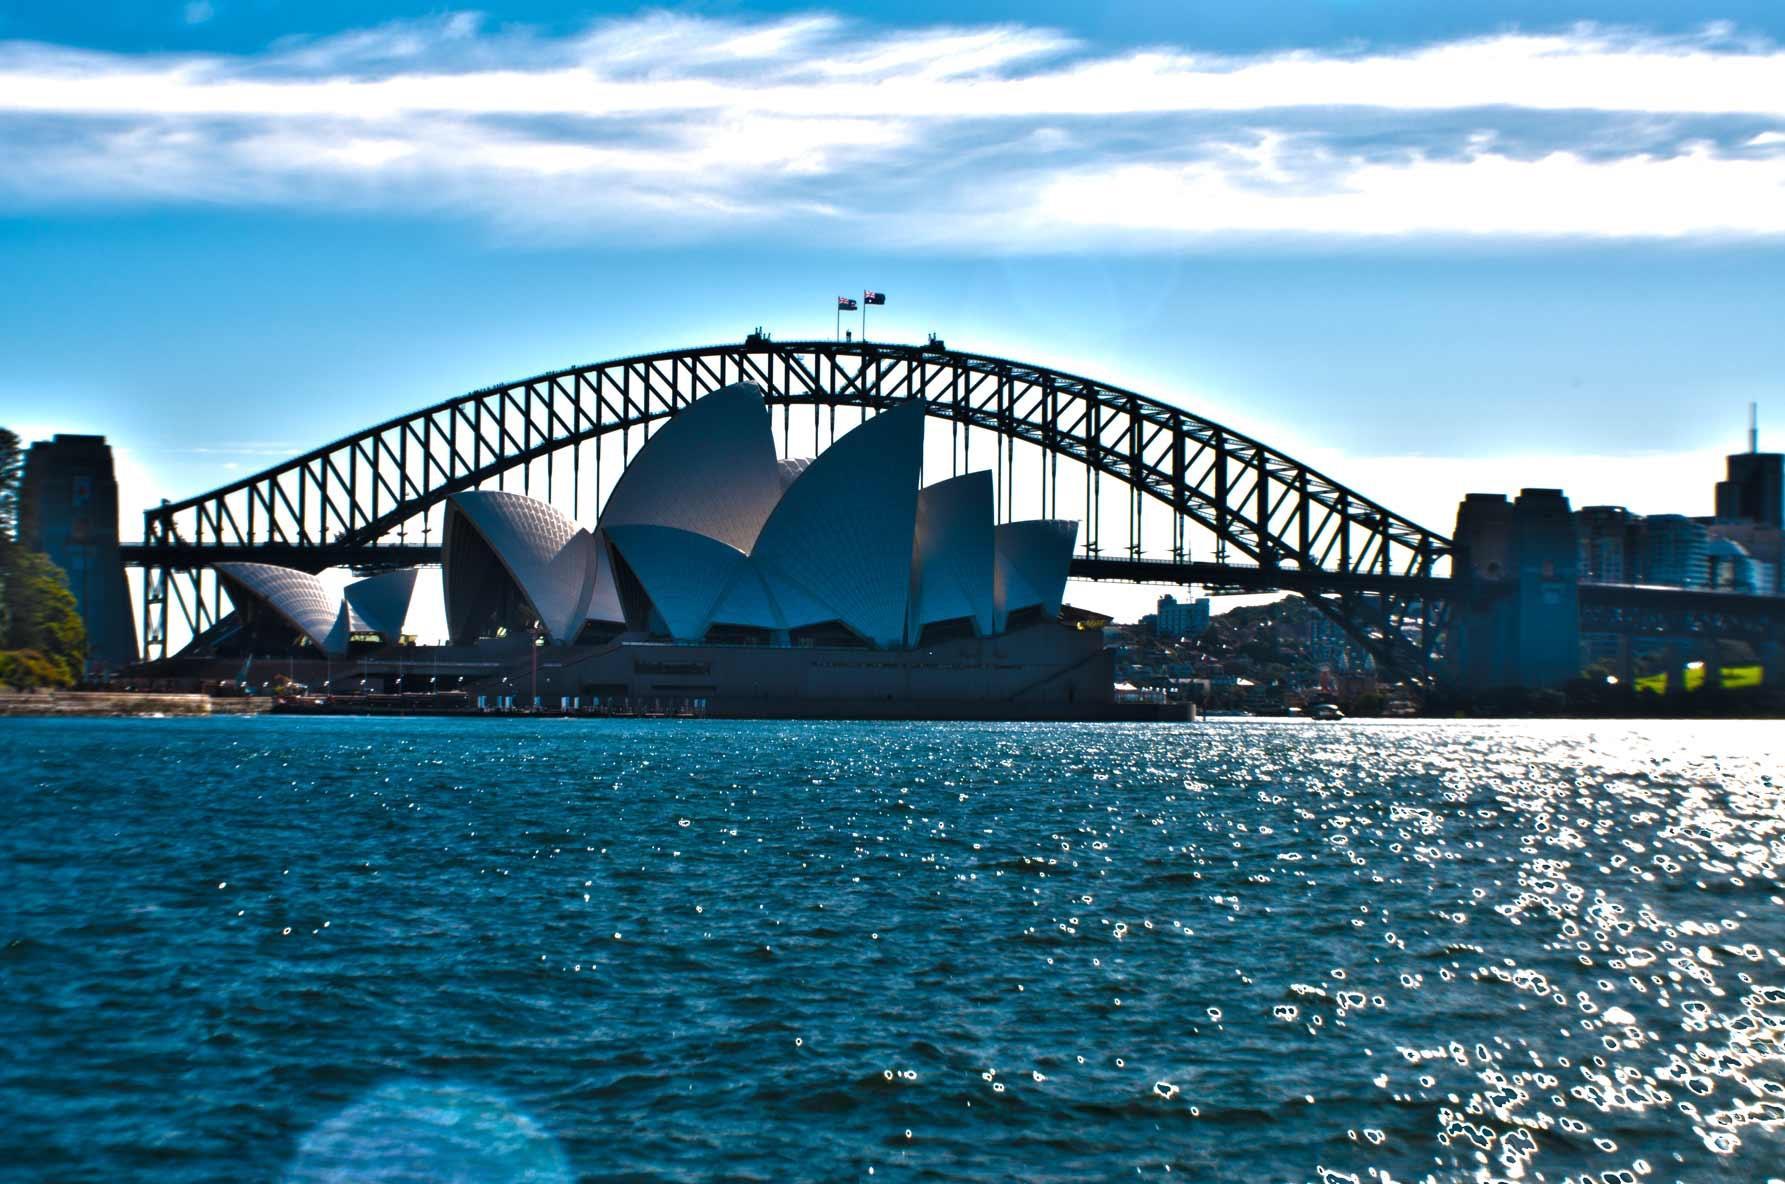 The iconic Opera House and Harbour Bridge in Sydney, Australia